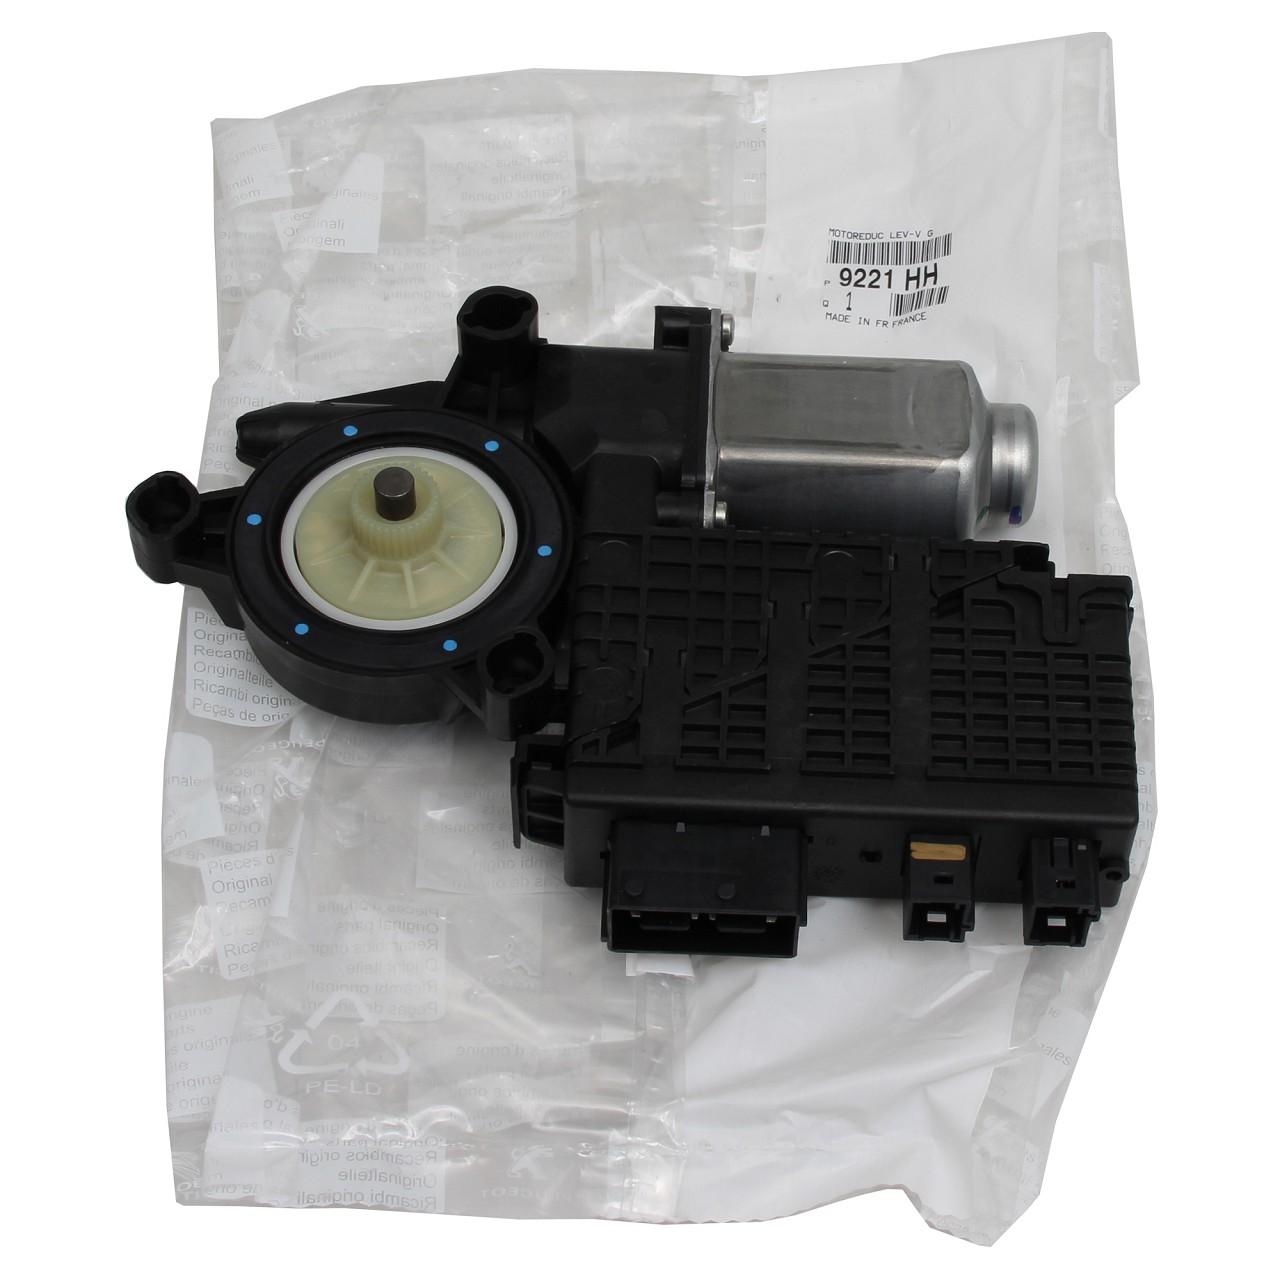 ORIGINAL Citroen Fensterhebermotor Motor f. Fensterheber VORNE LINKS 9221.HH